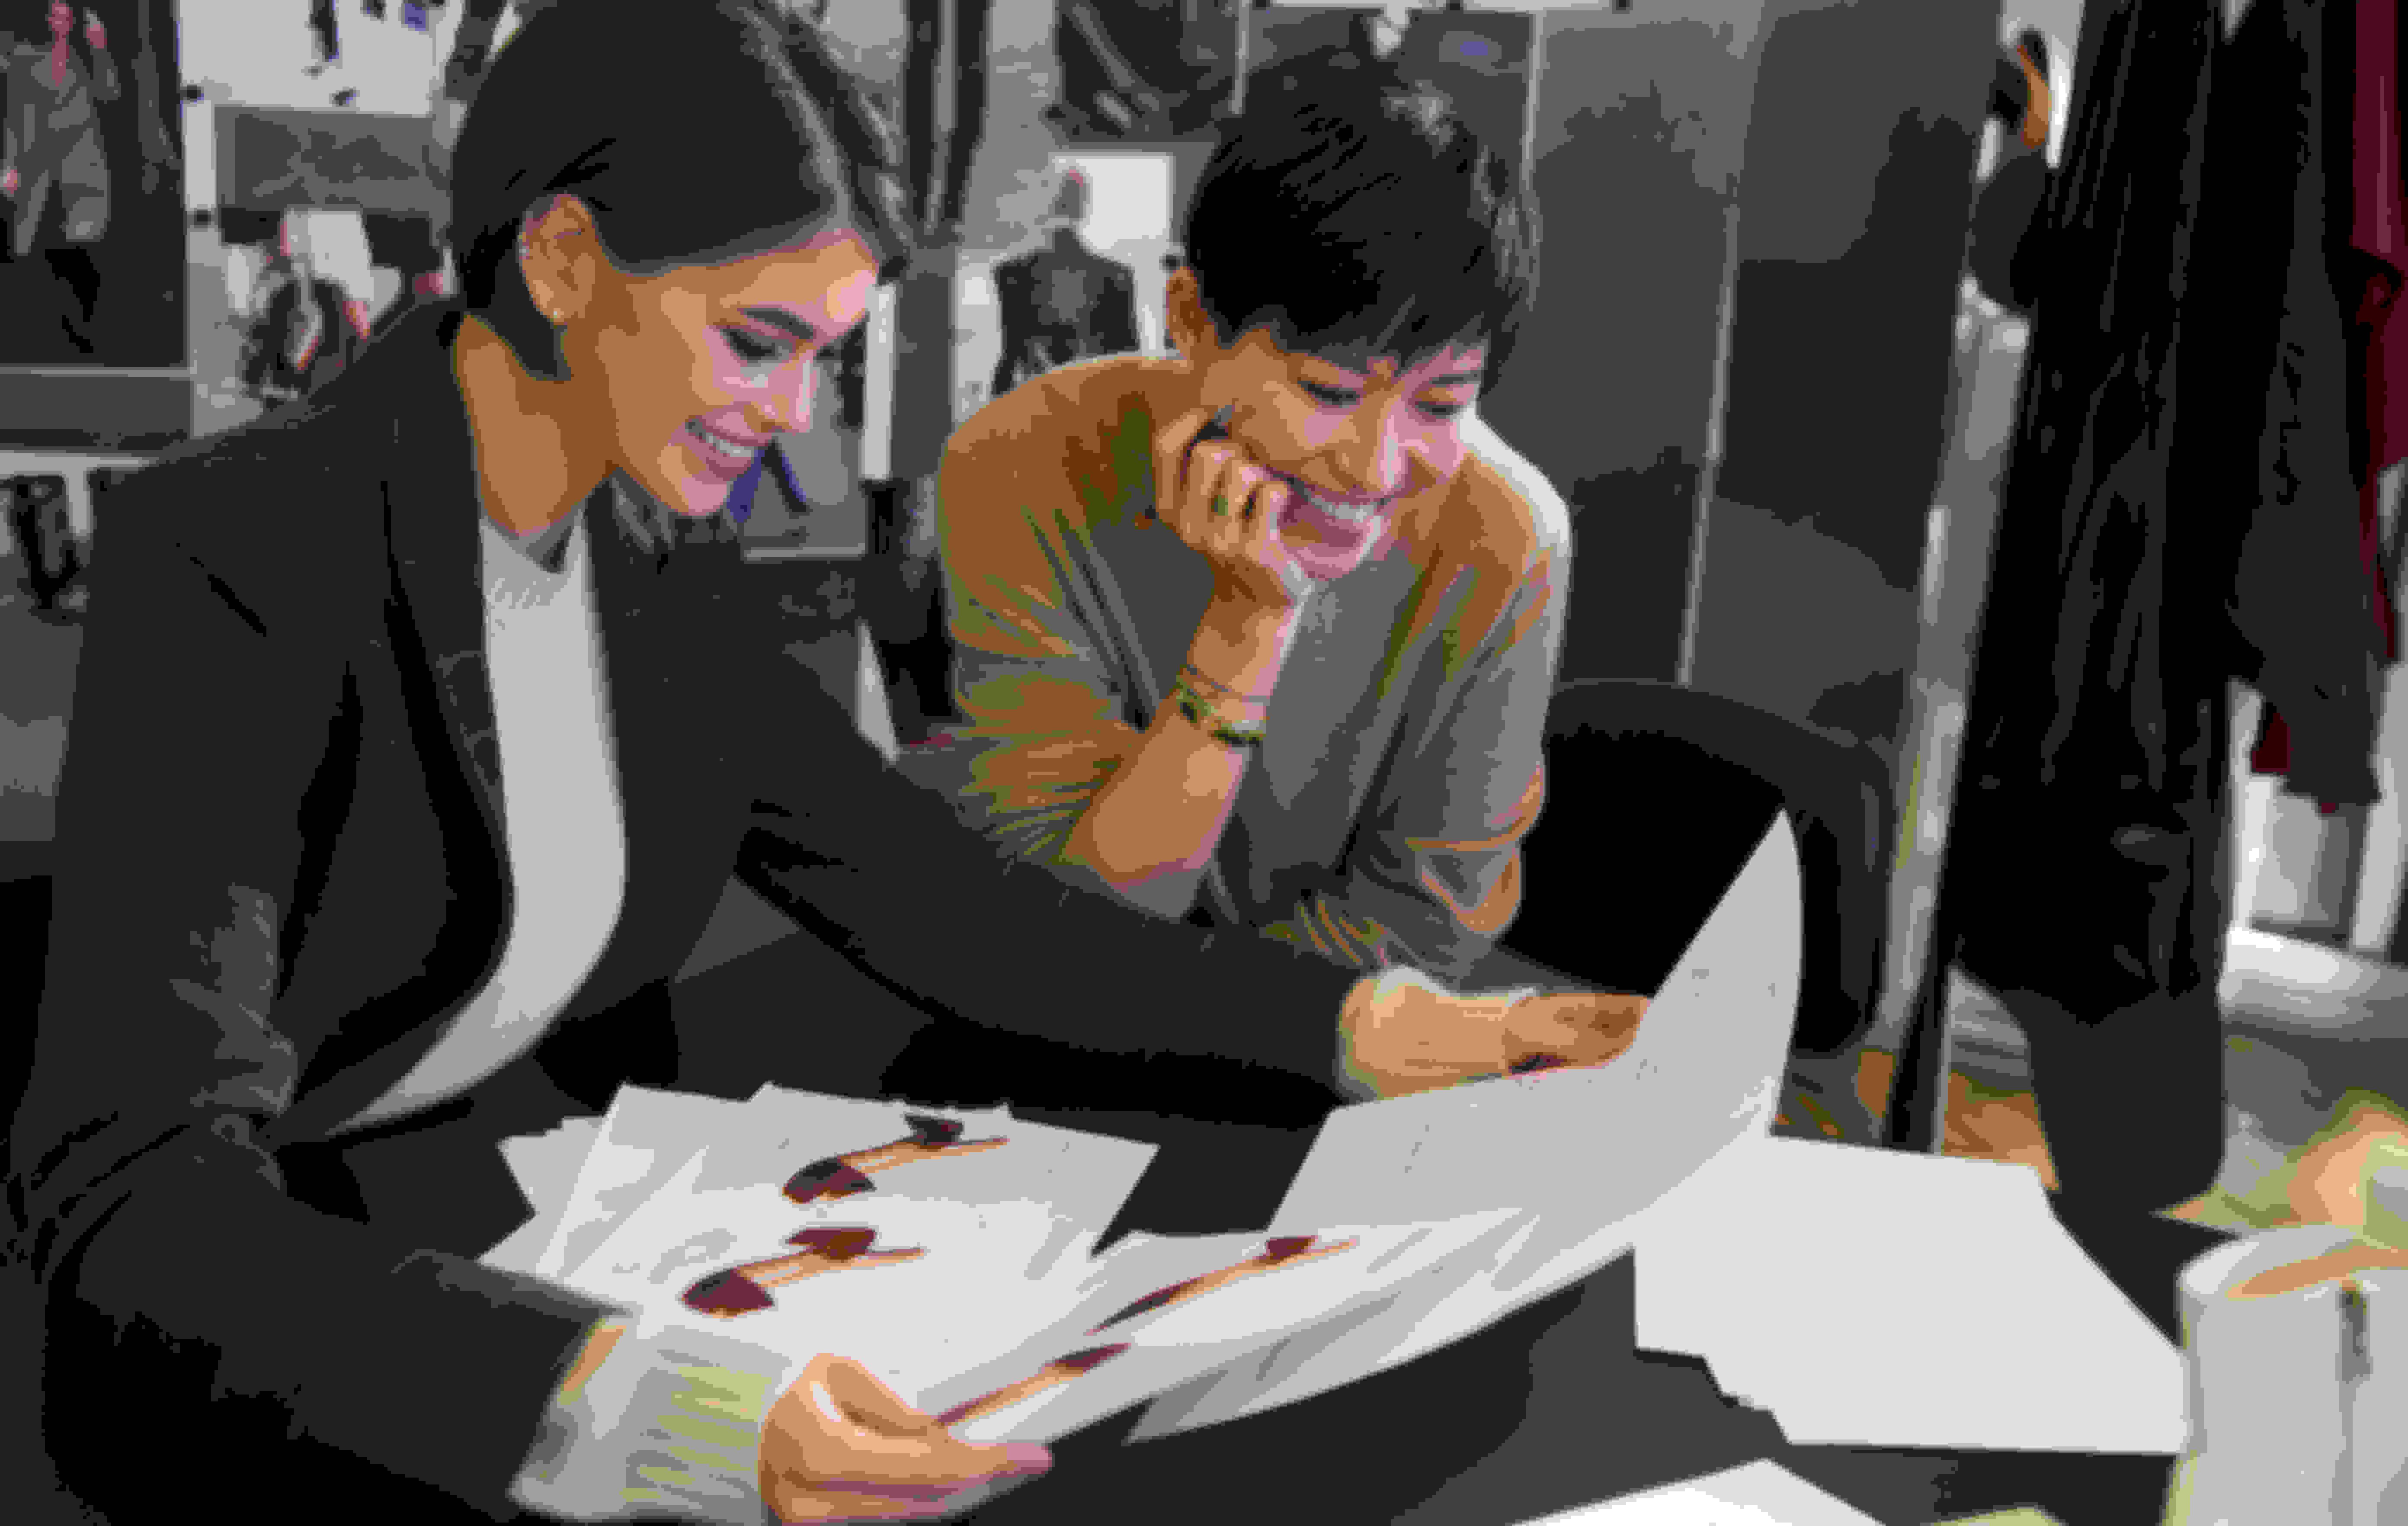 Kaia and Creative Director Sandra Choi at the Design Studio